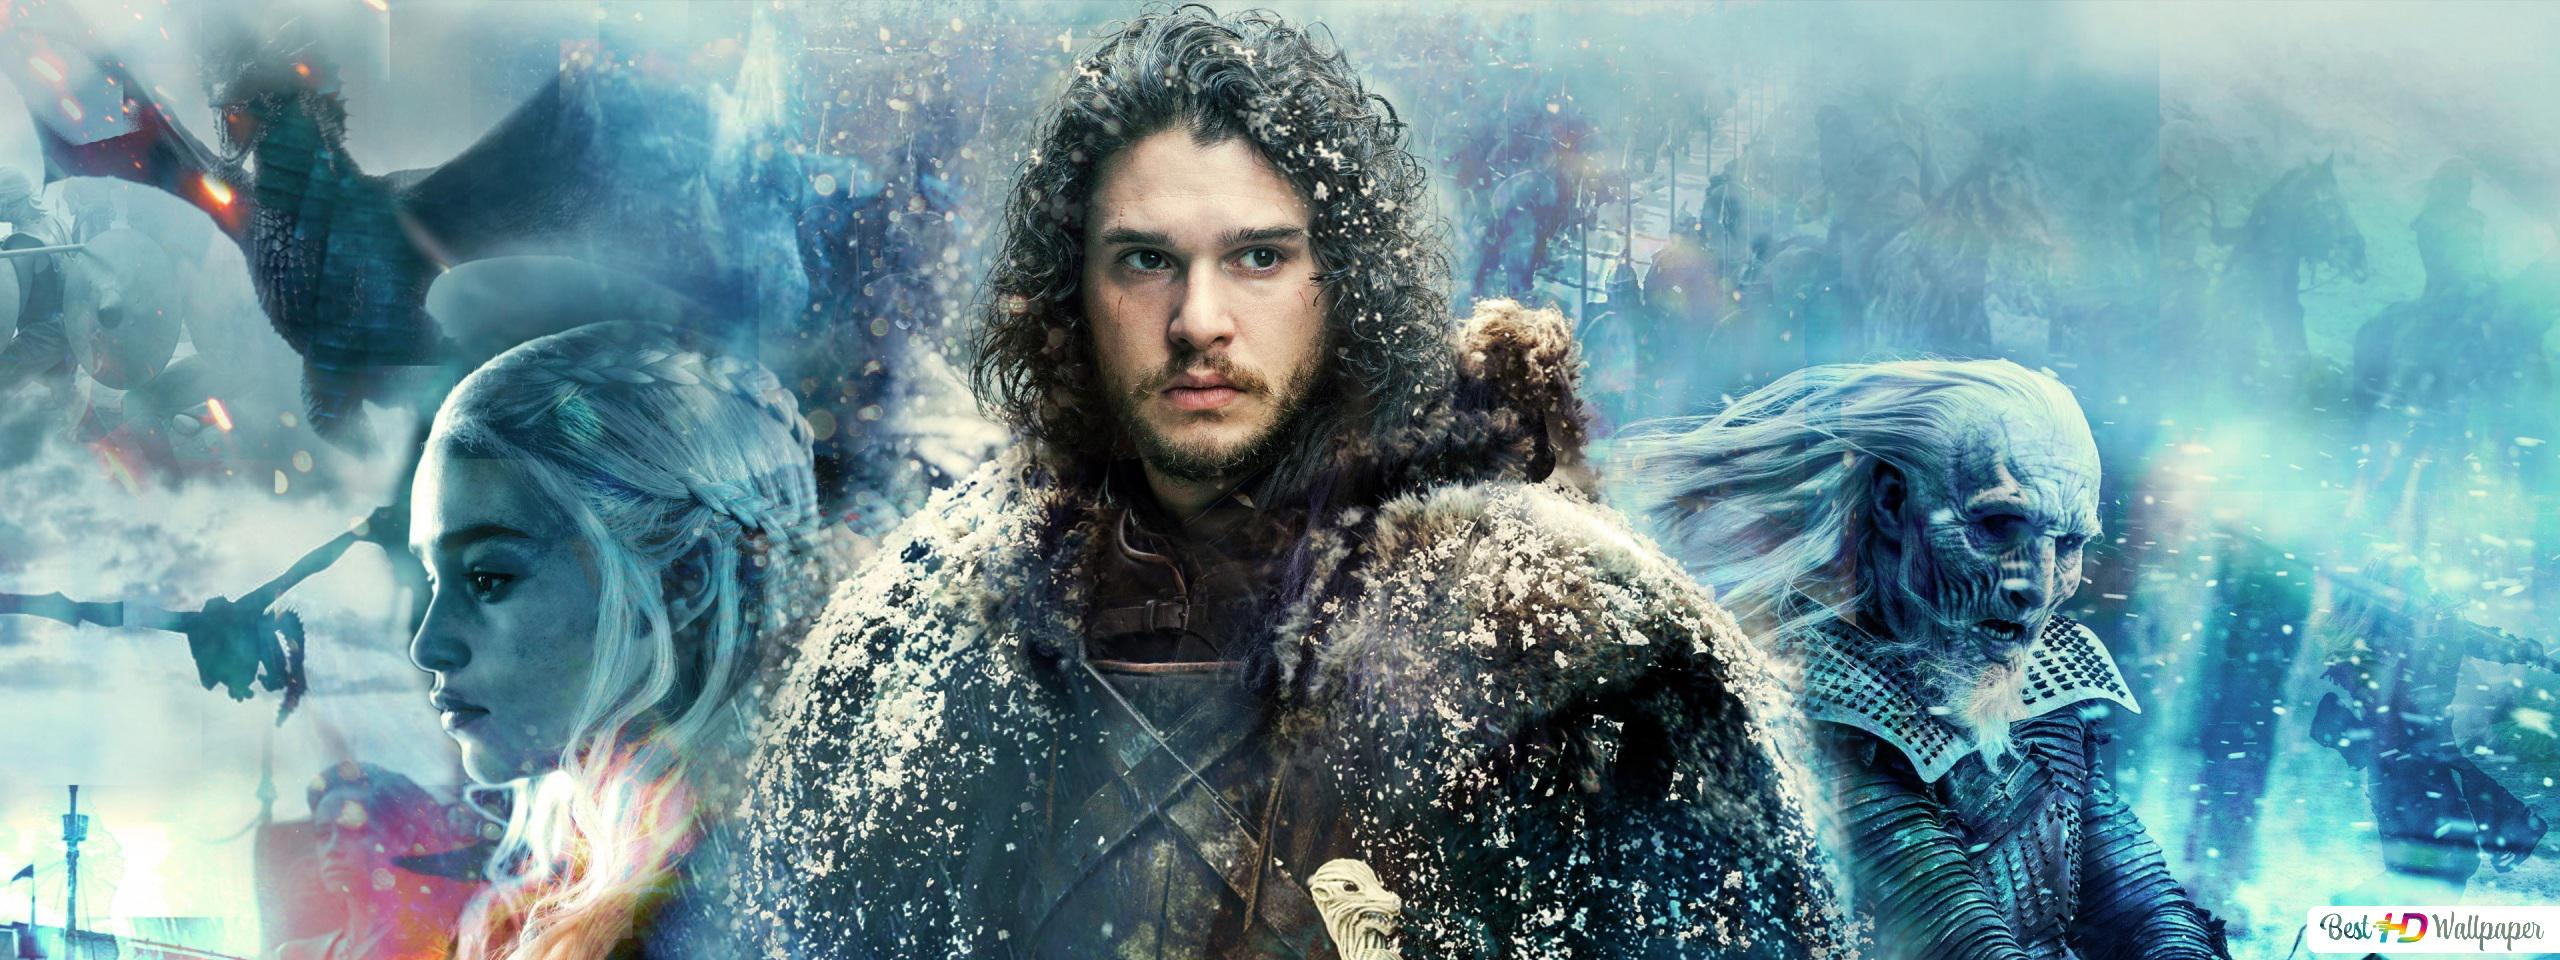 Game Of Thrones Series Jon Snow Hd Wallpaper Download